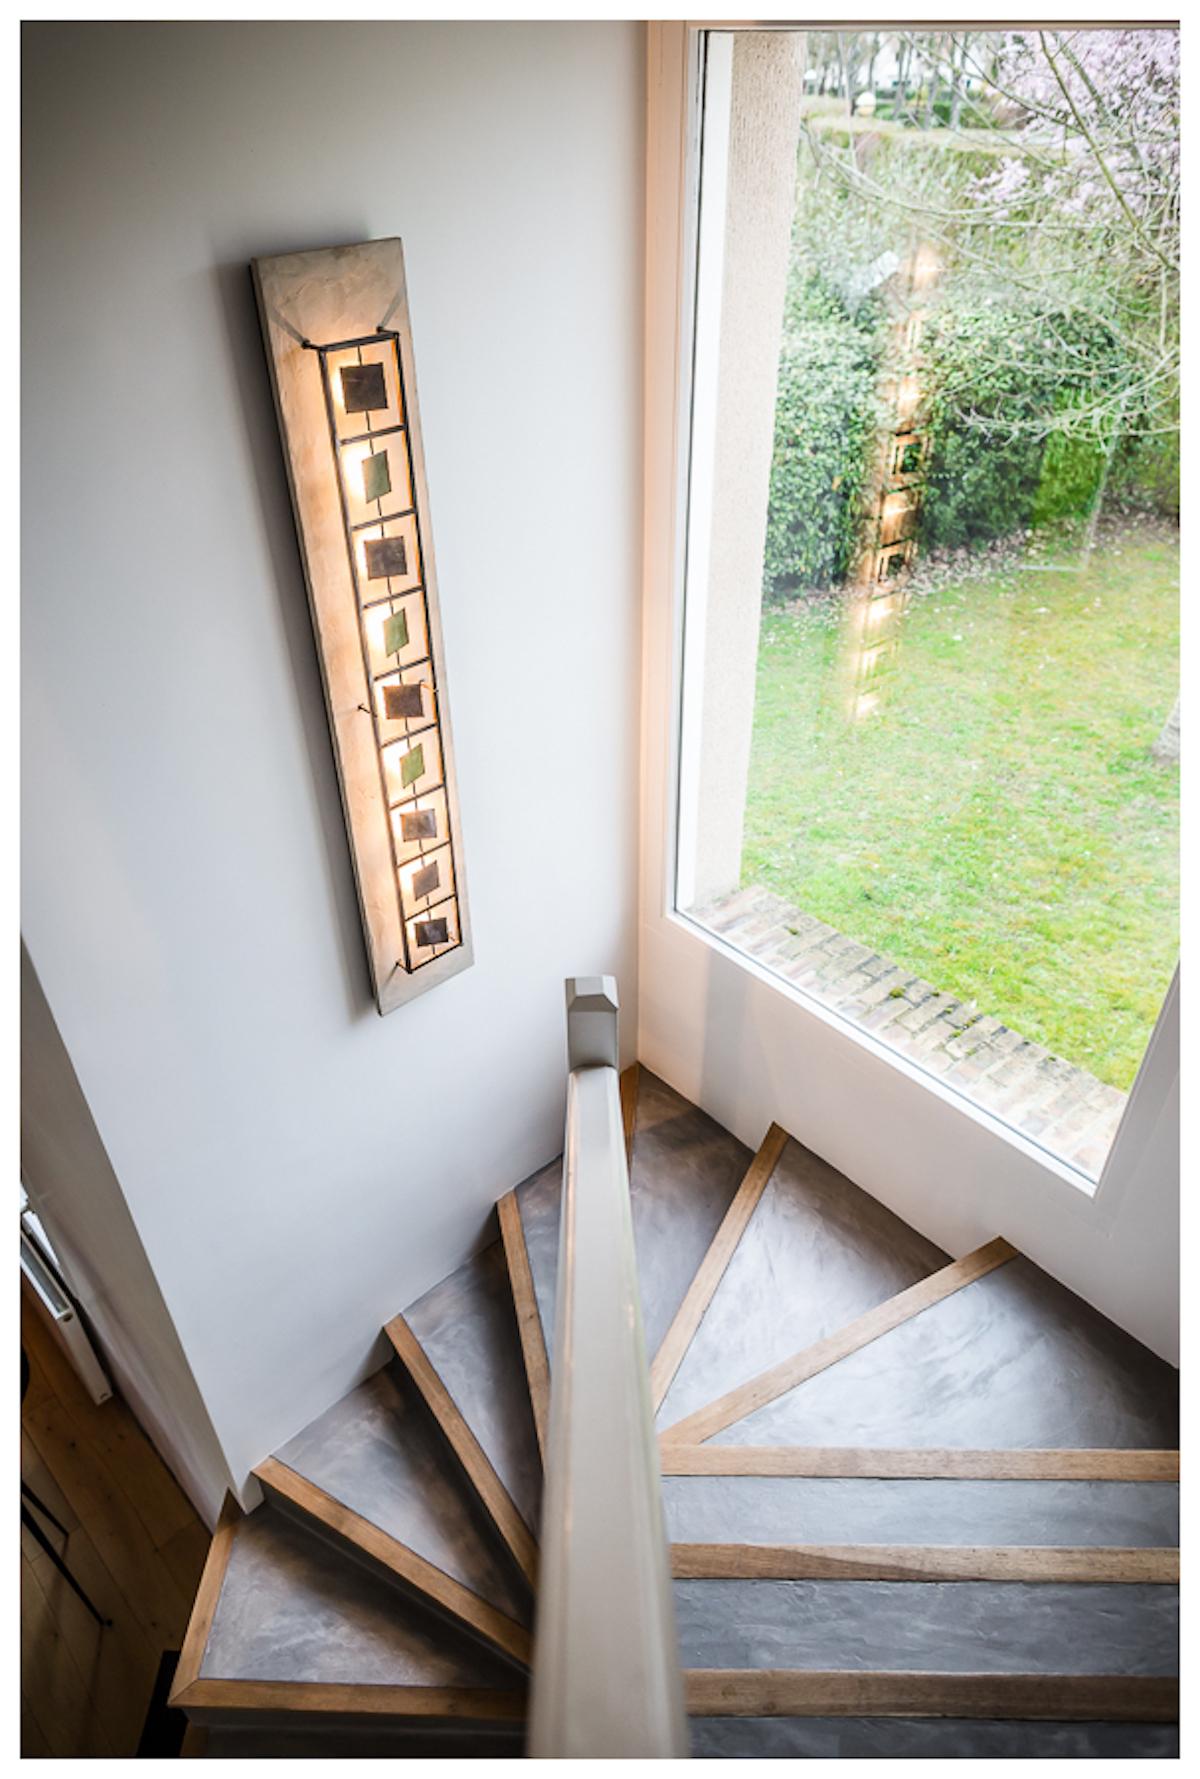 Renovation-decoration-maison-77-carre-5-original